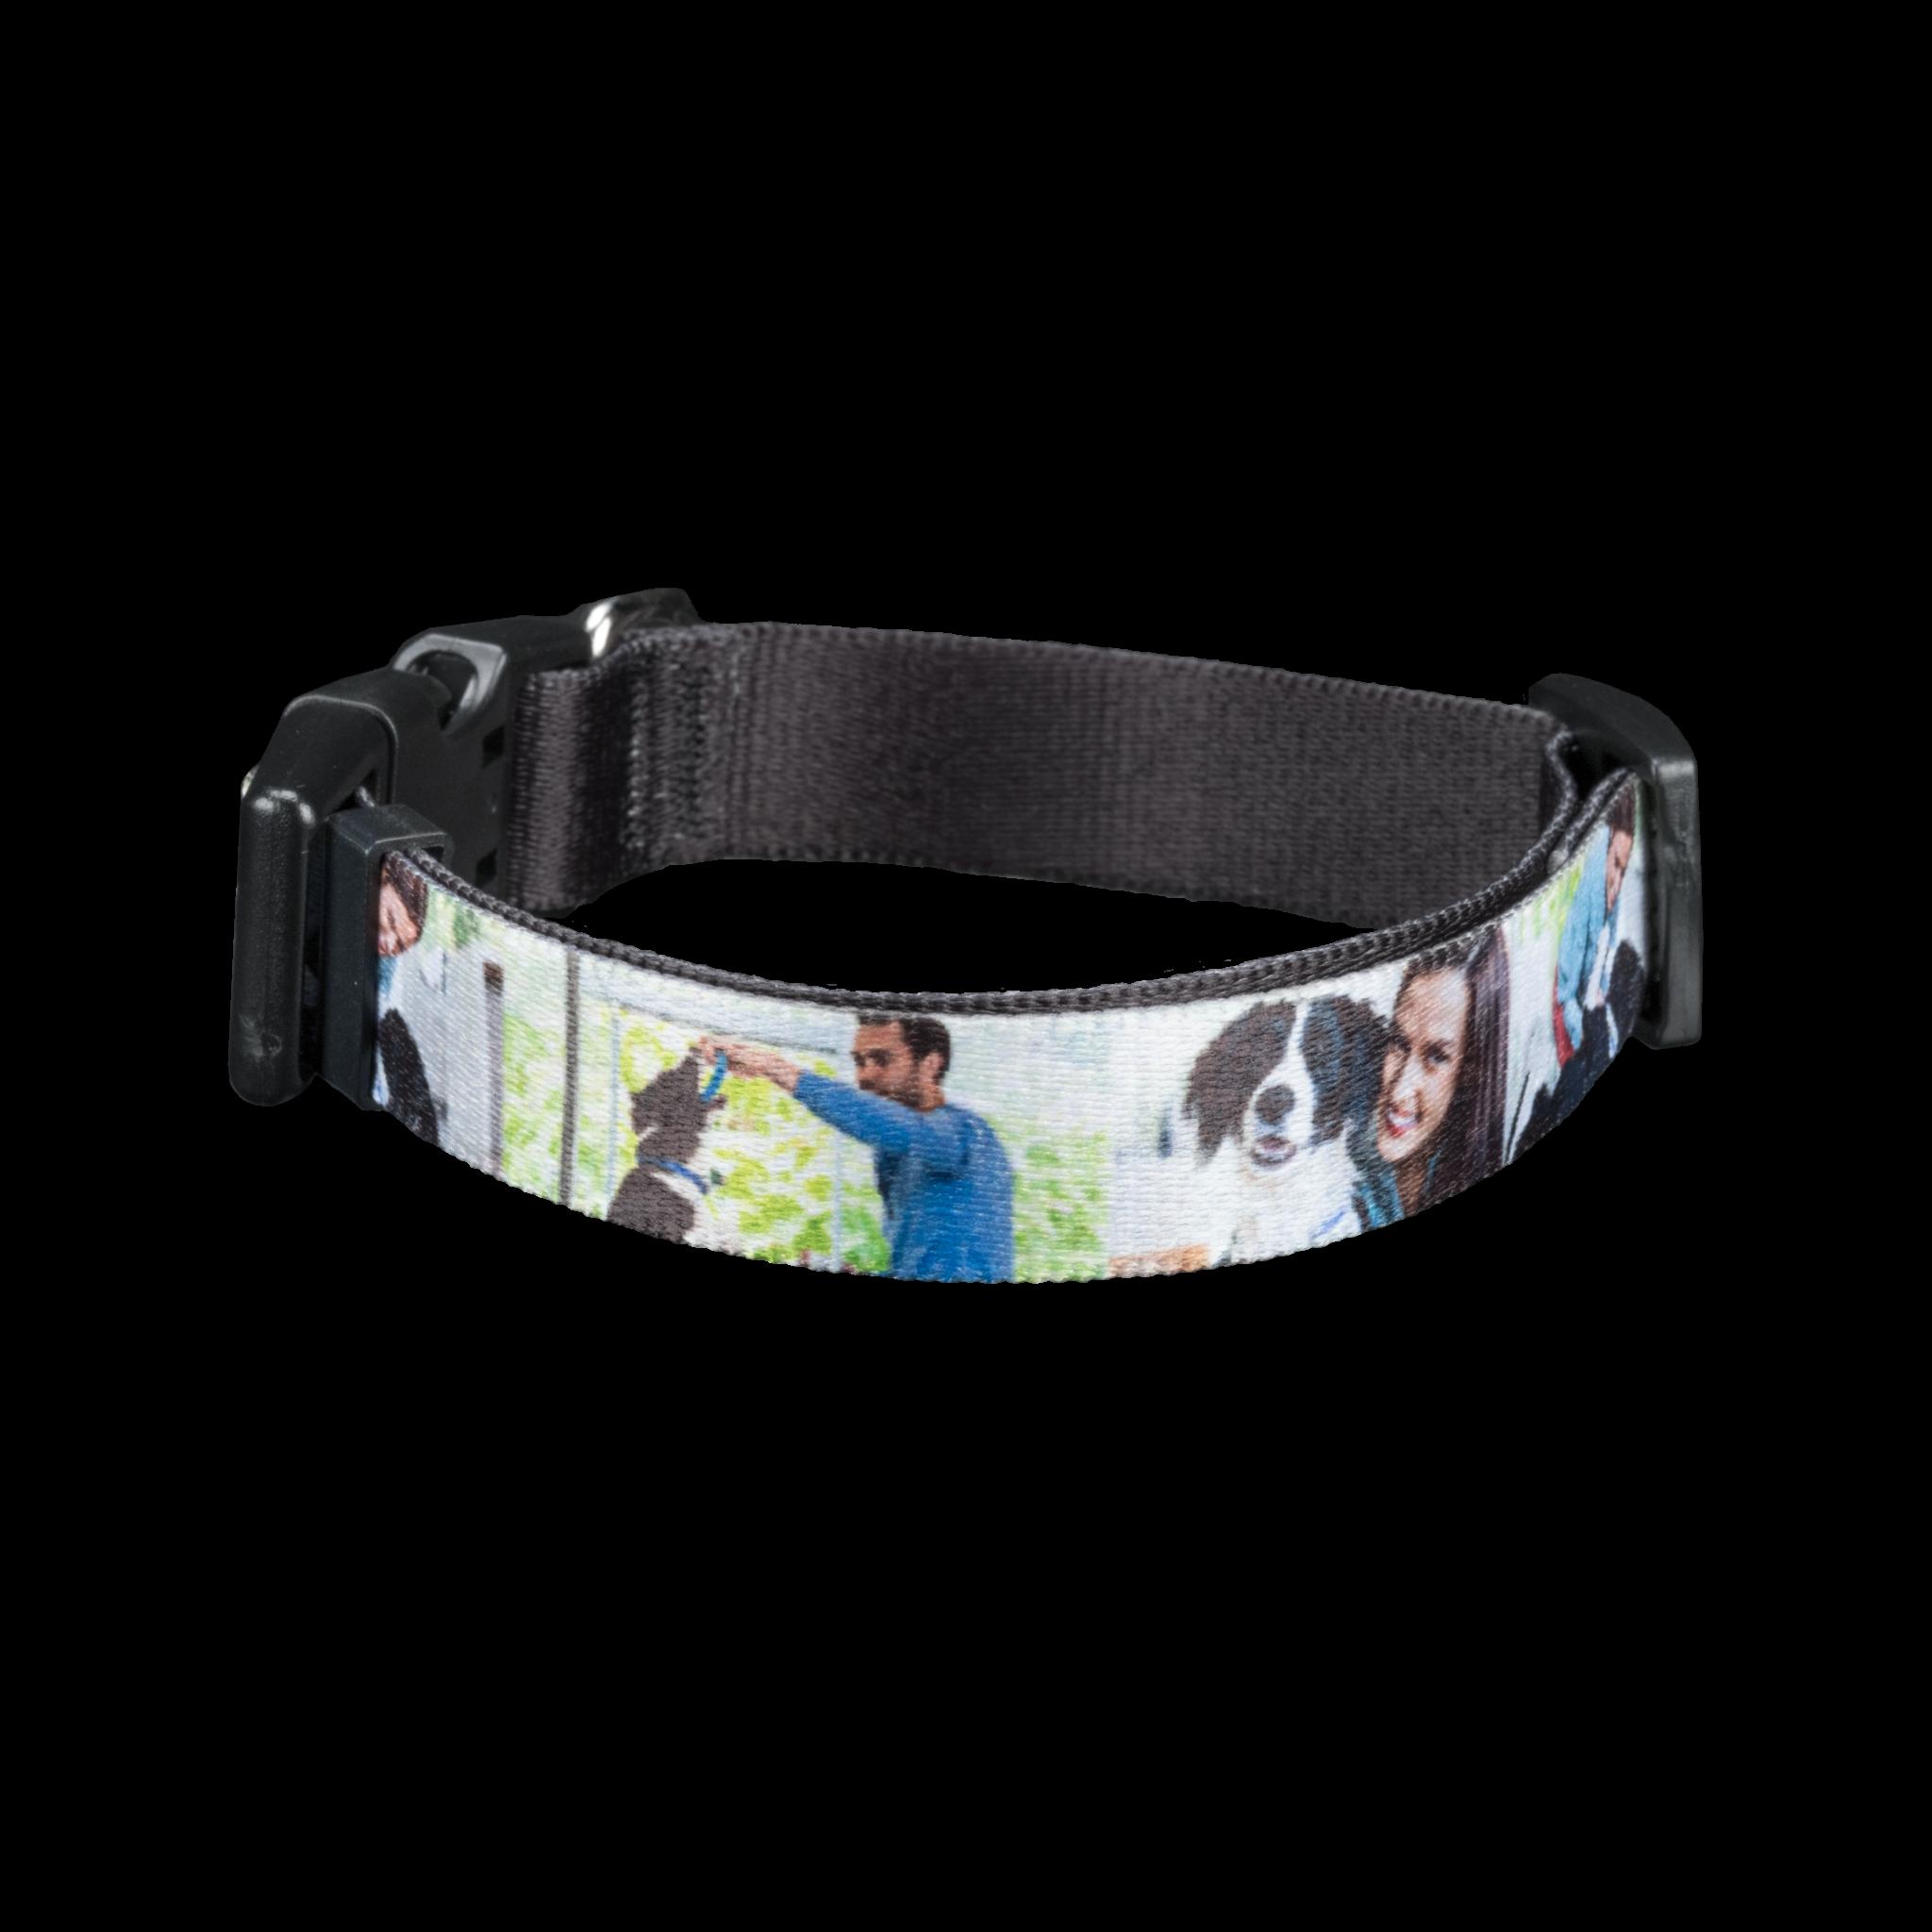 Pet Photo Collar, Small